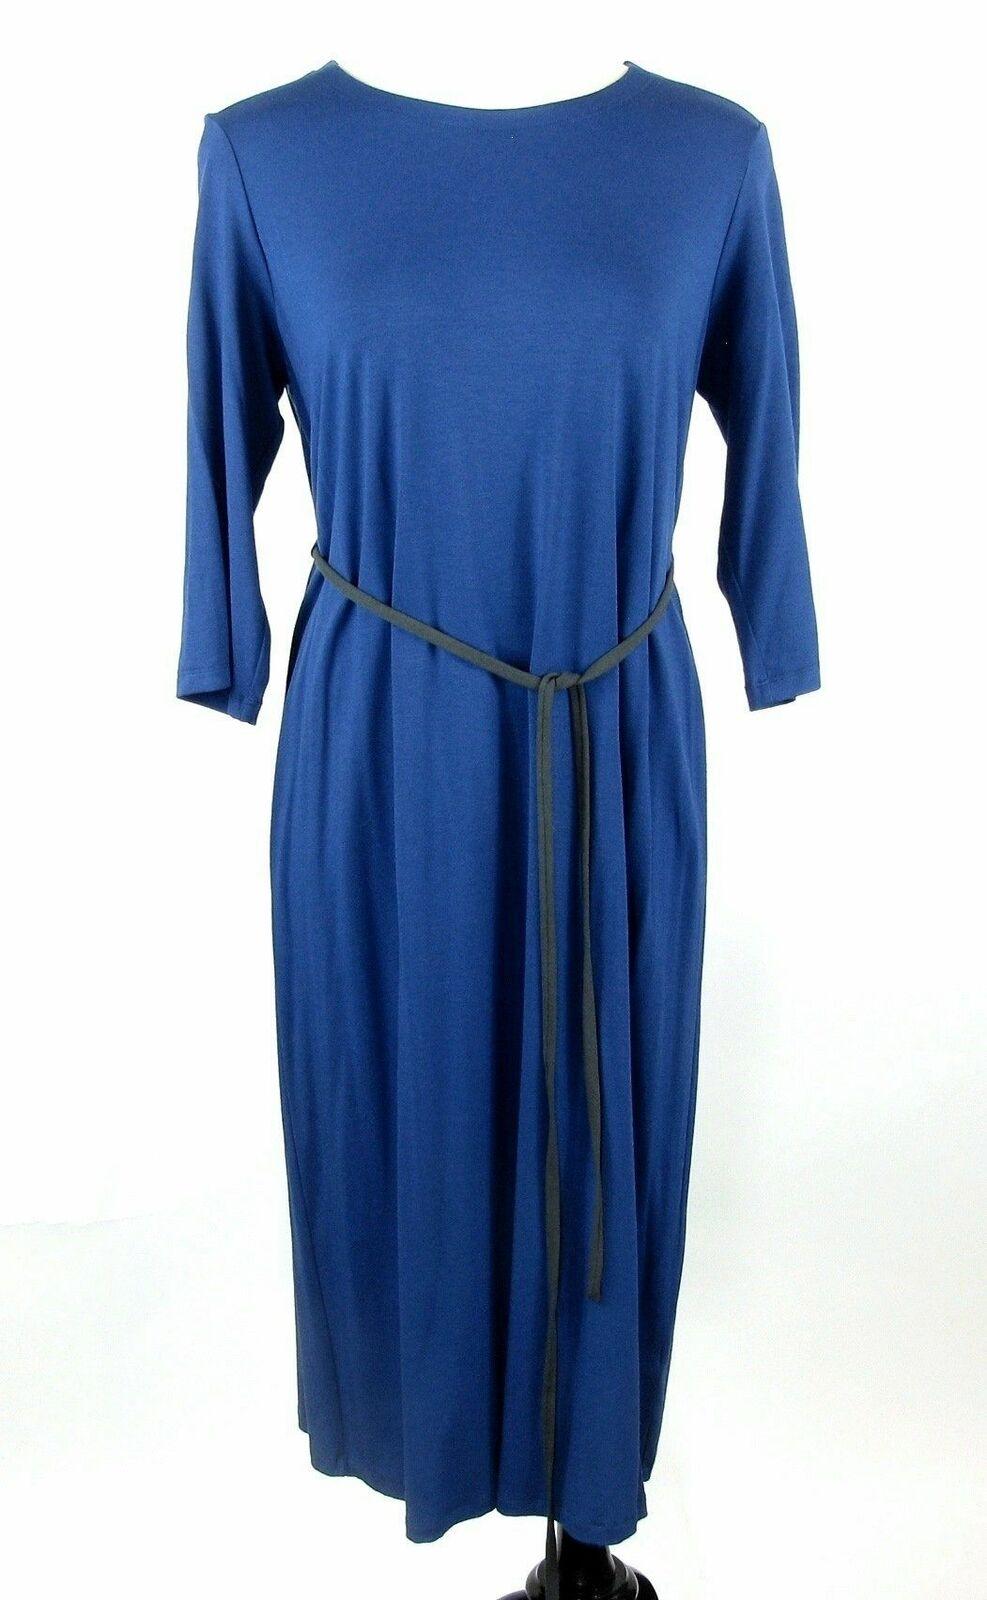 Eileen Fisher Größe Small New Blau Jersey Knit Dress